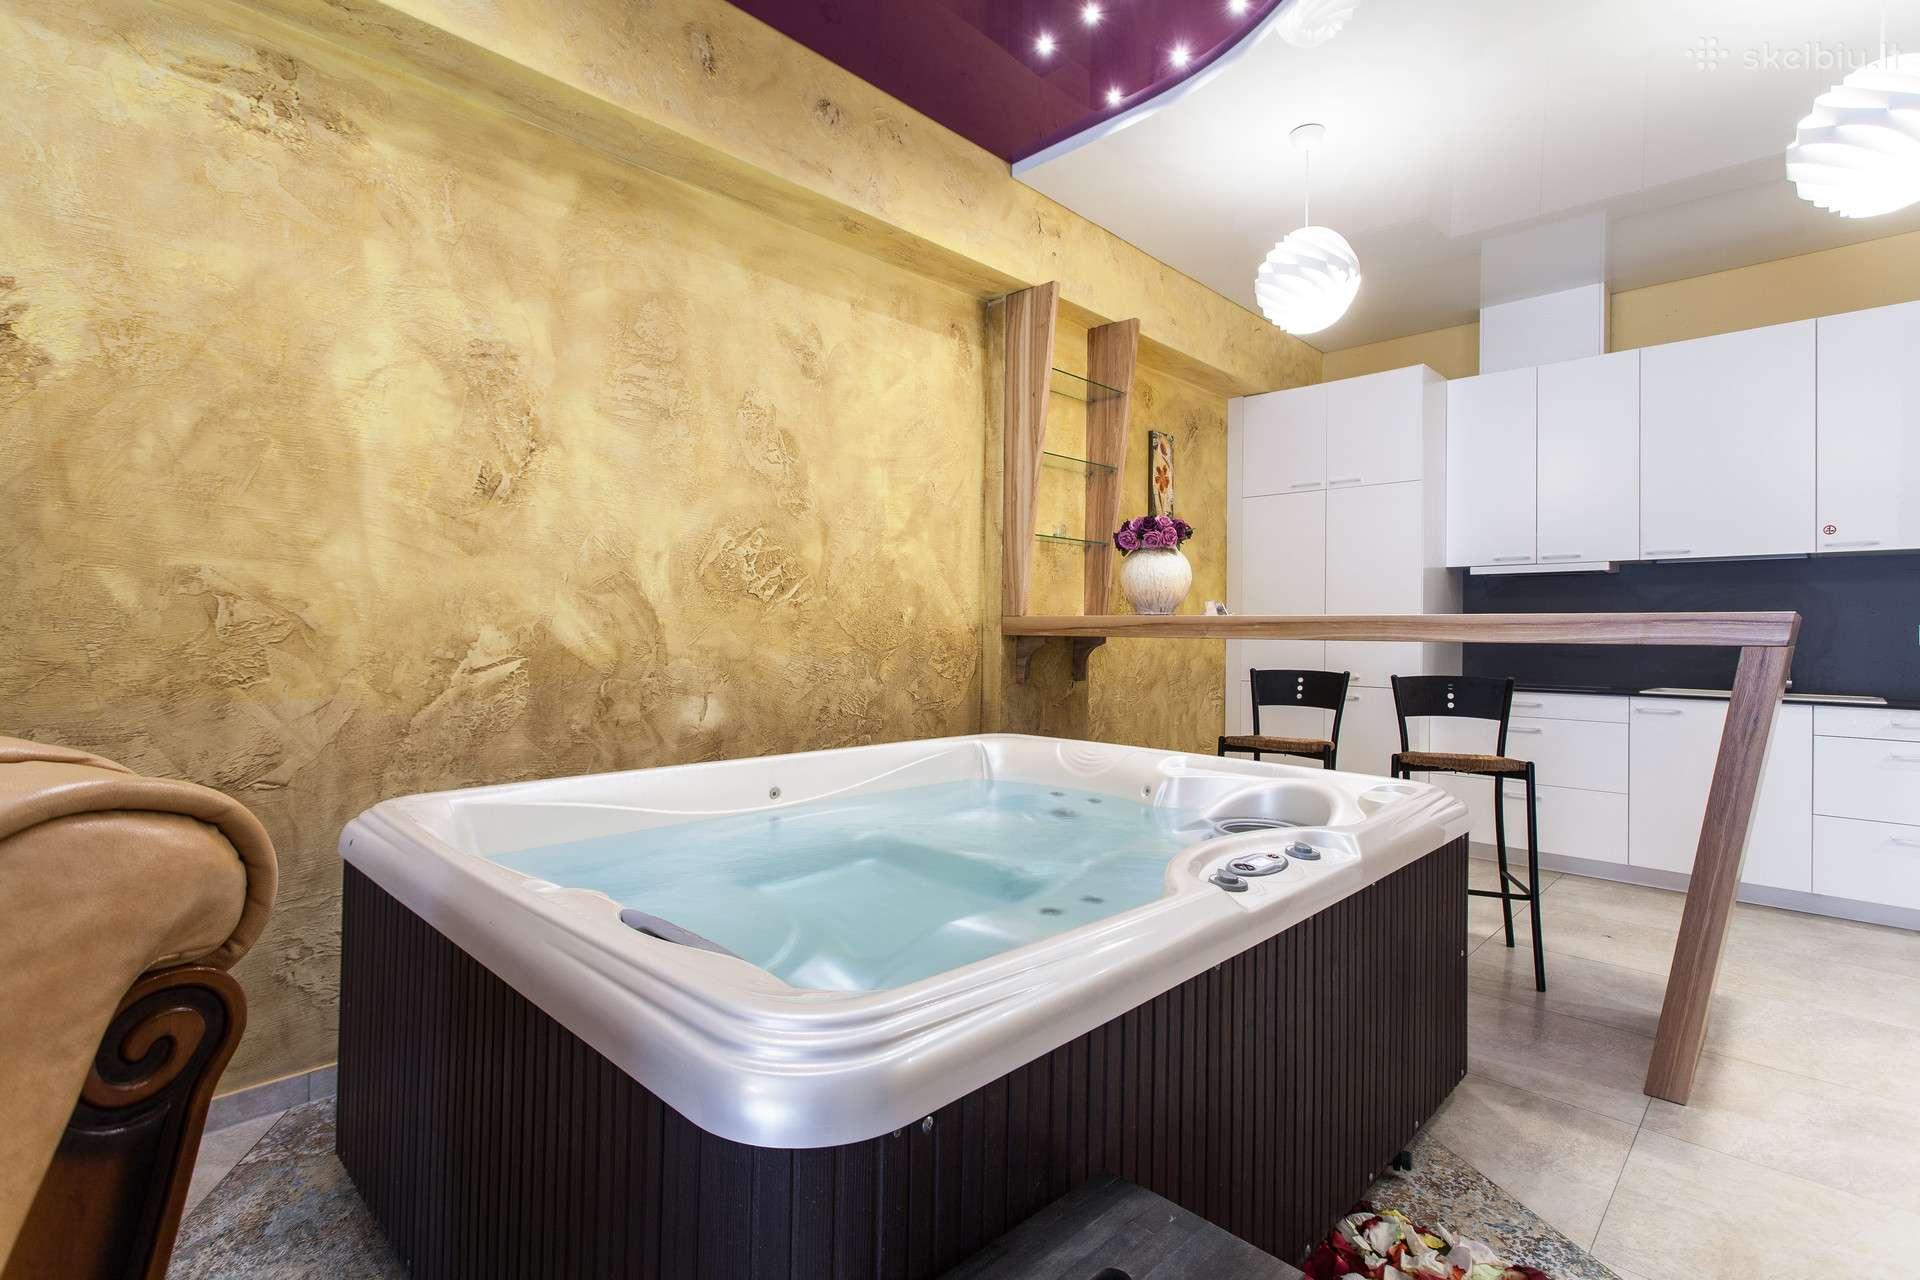 Jacuzzi Interior.Apartamentu Nuoma Su Sauna Ir Jacuzzi Dzakuzi